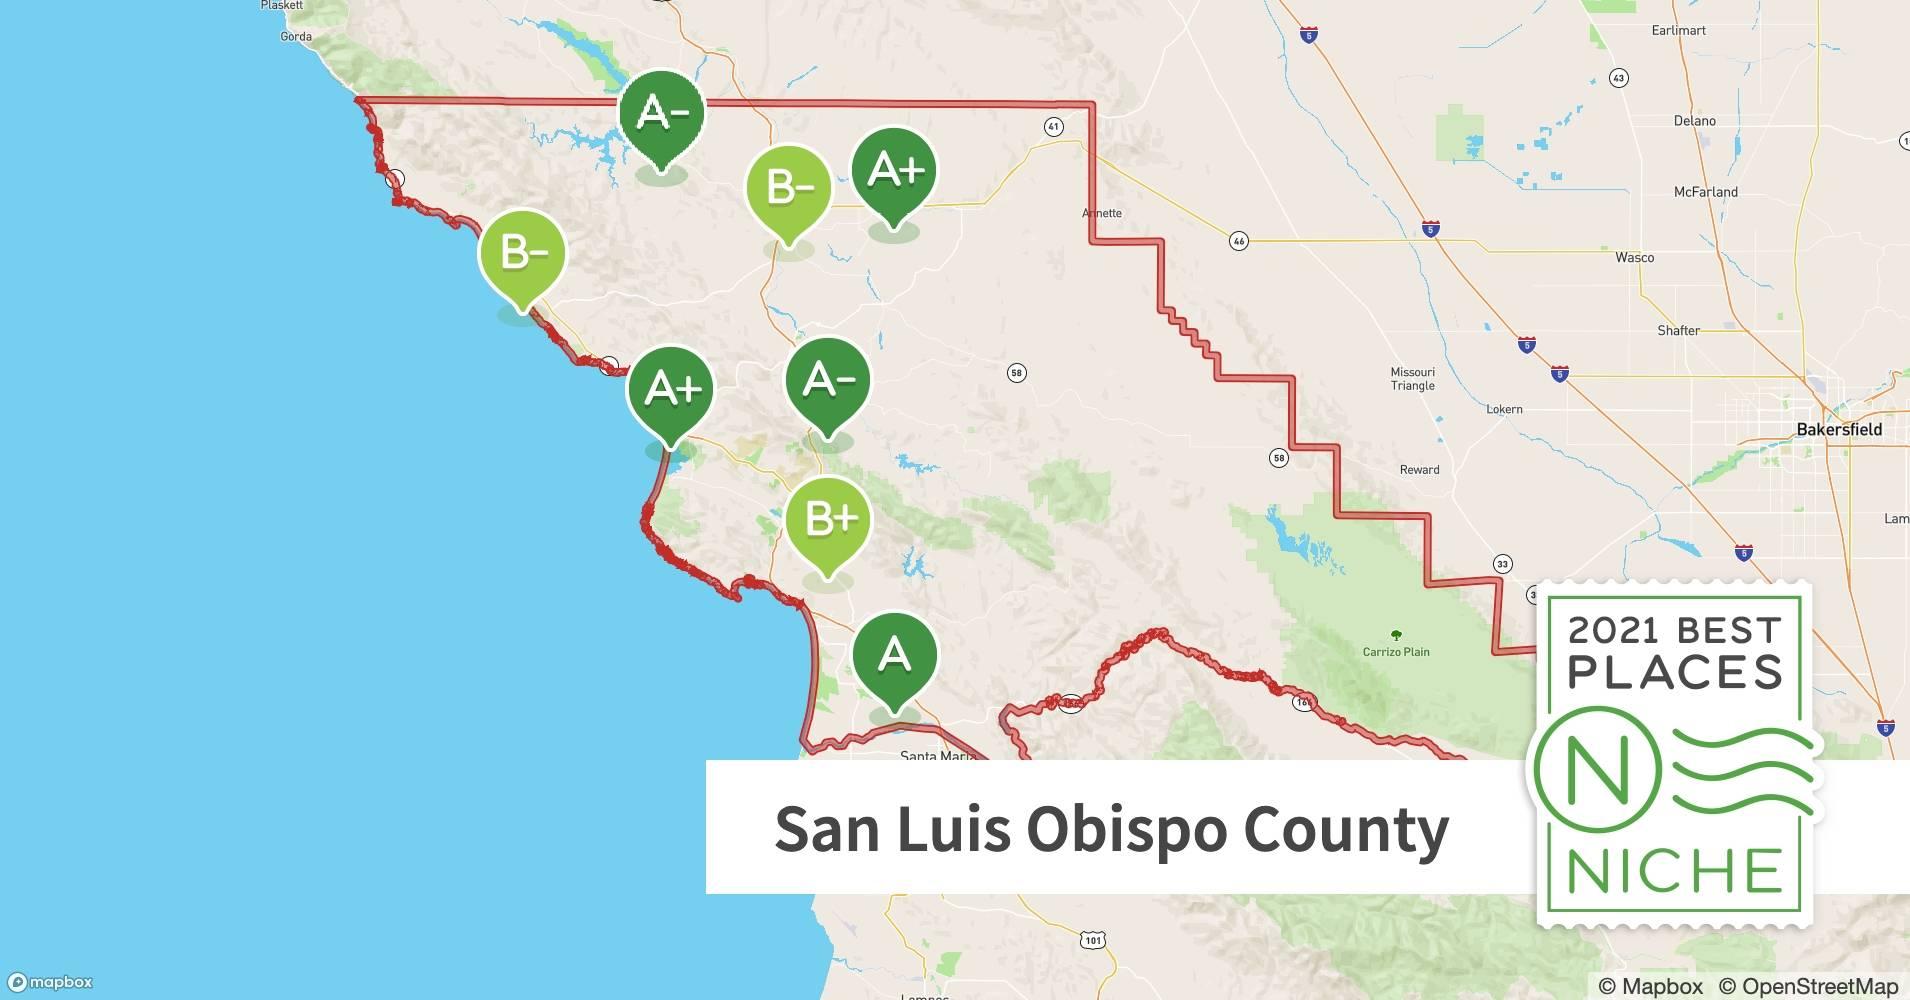 2021 Best Places To Live In San Luis Obispo County Ca Niche